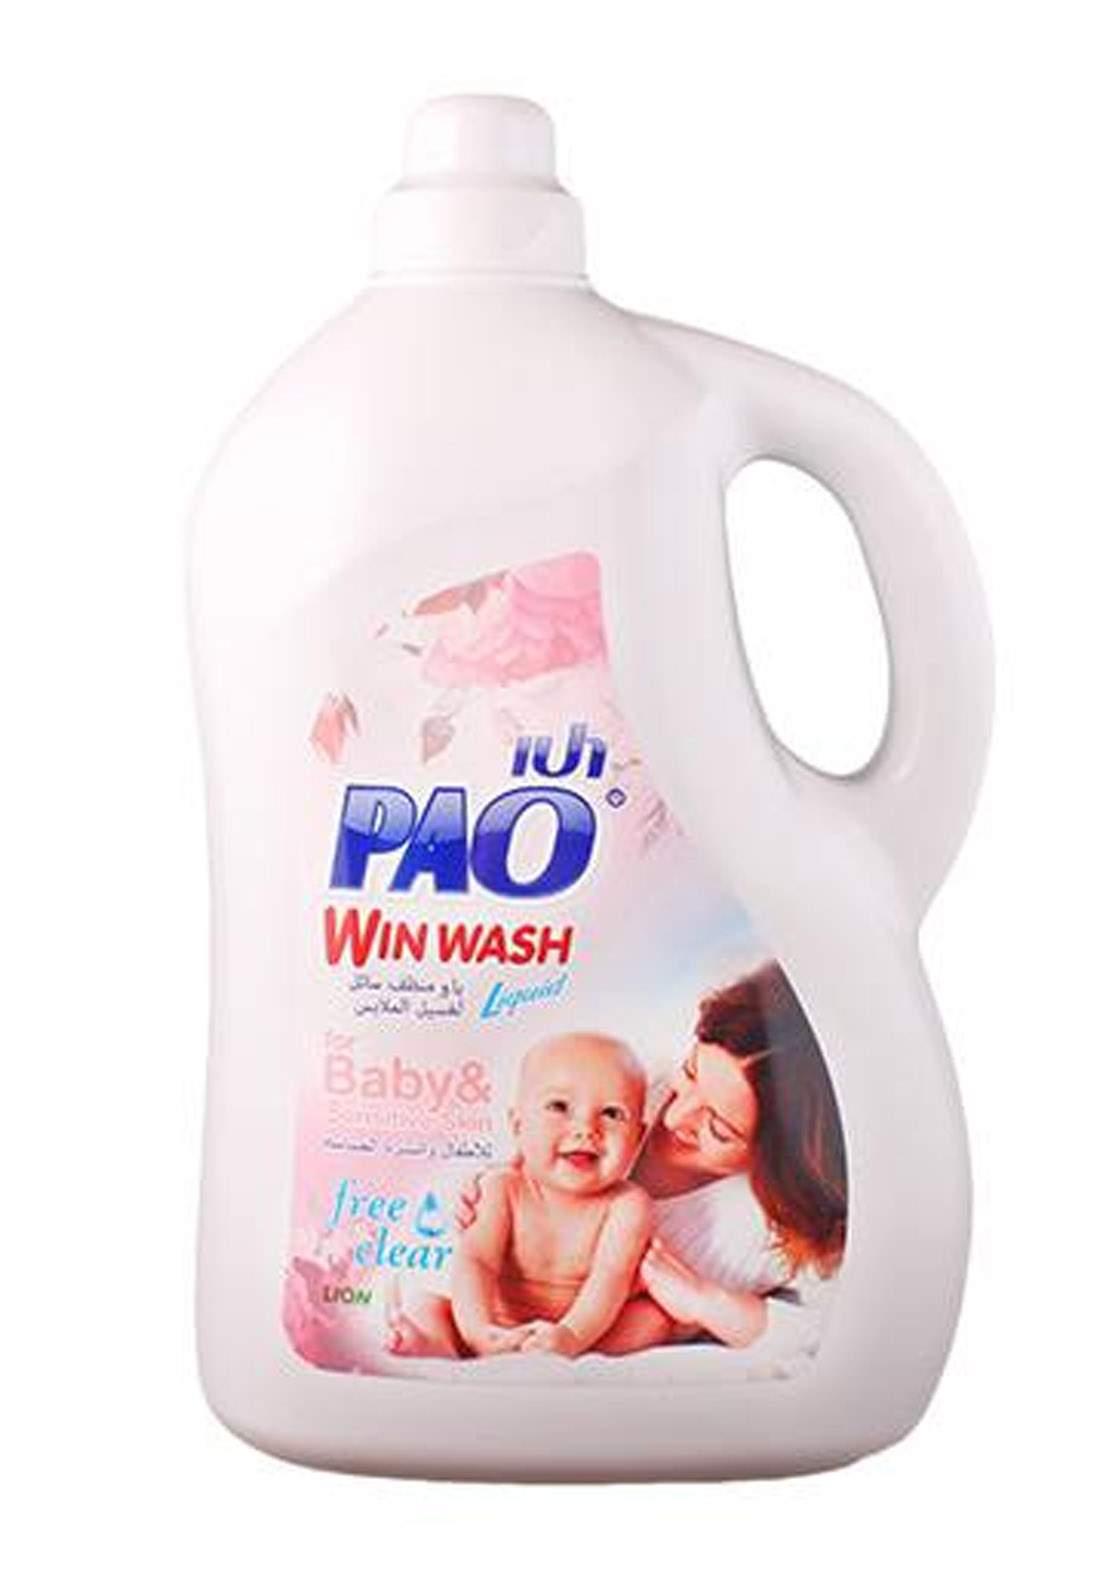 Iuh Pao Win Wash Liquid Detergent Formula For Baby & Sensitive Skin 3 L سائل غسيل ملابس الاطفال